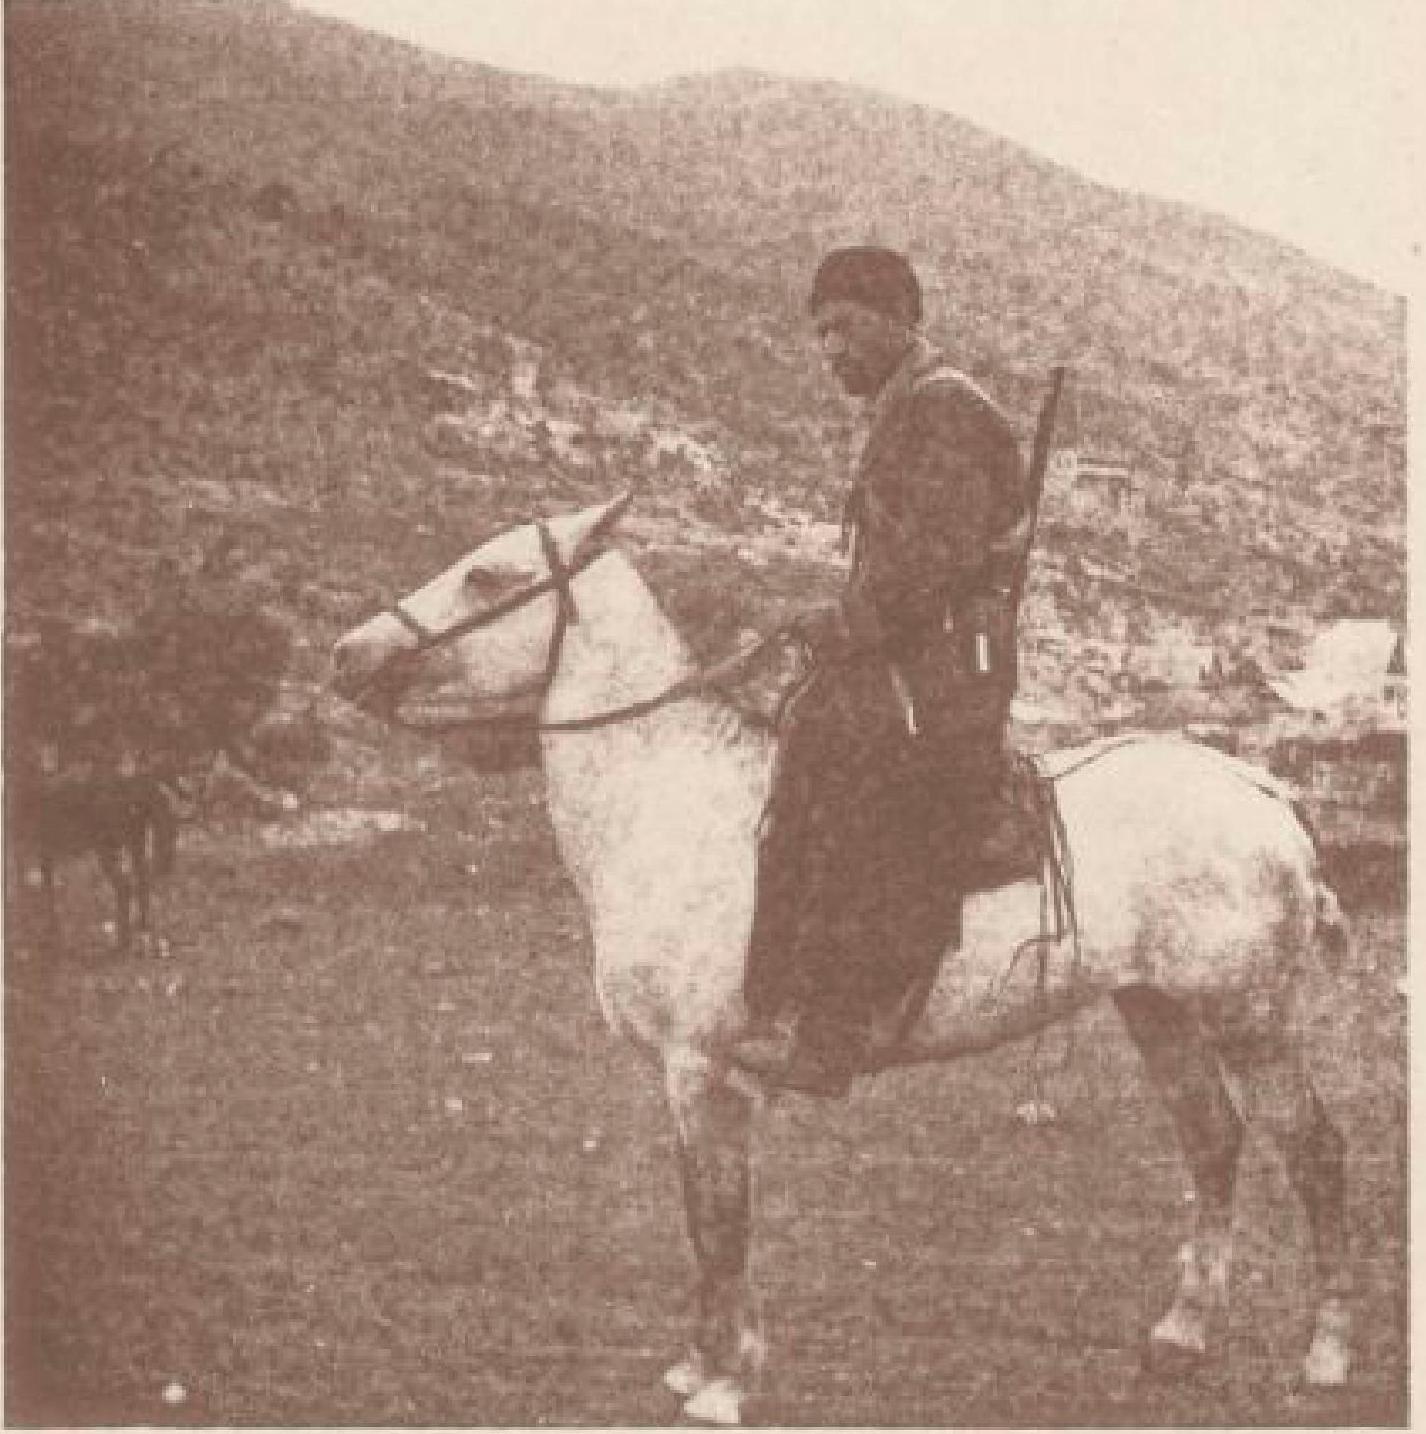 06. Чубучлы. Казак на коне. 24 октября 1897